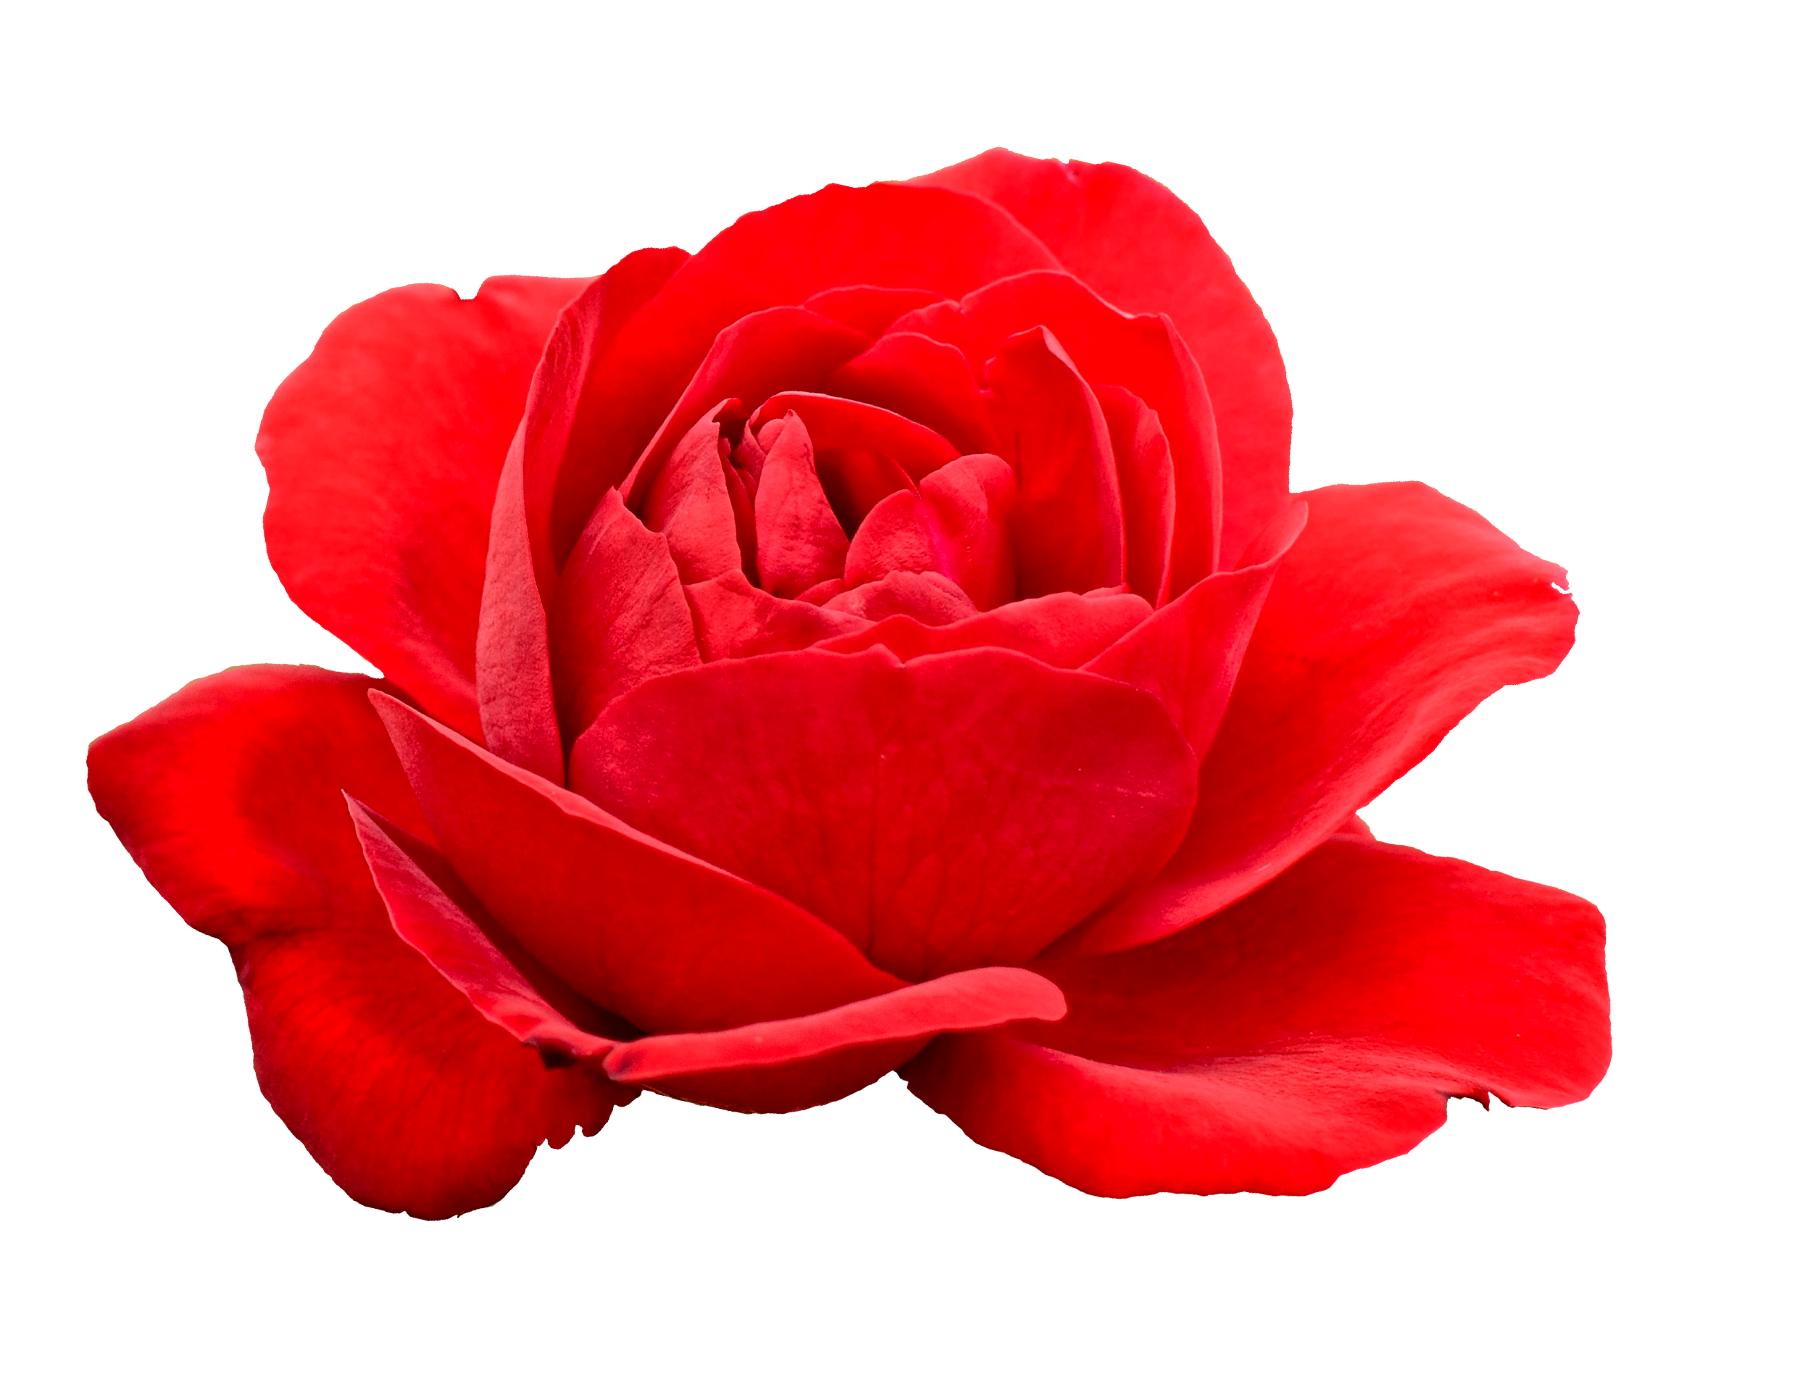 30+ Flower Backgrounds - JPEG, PNG Format Download! | Free ...